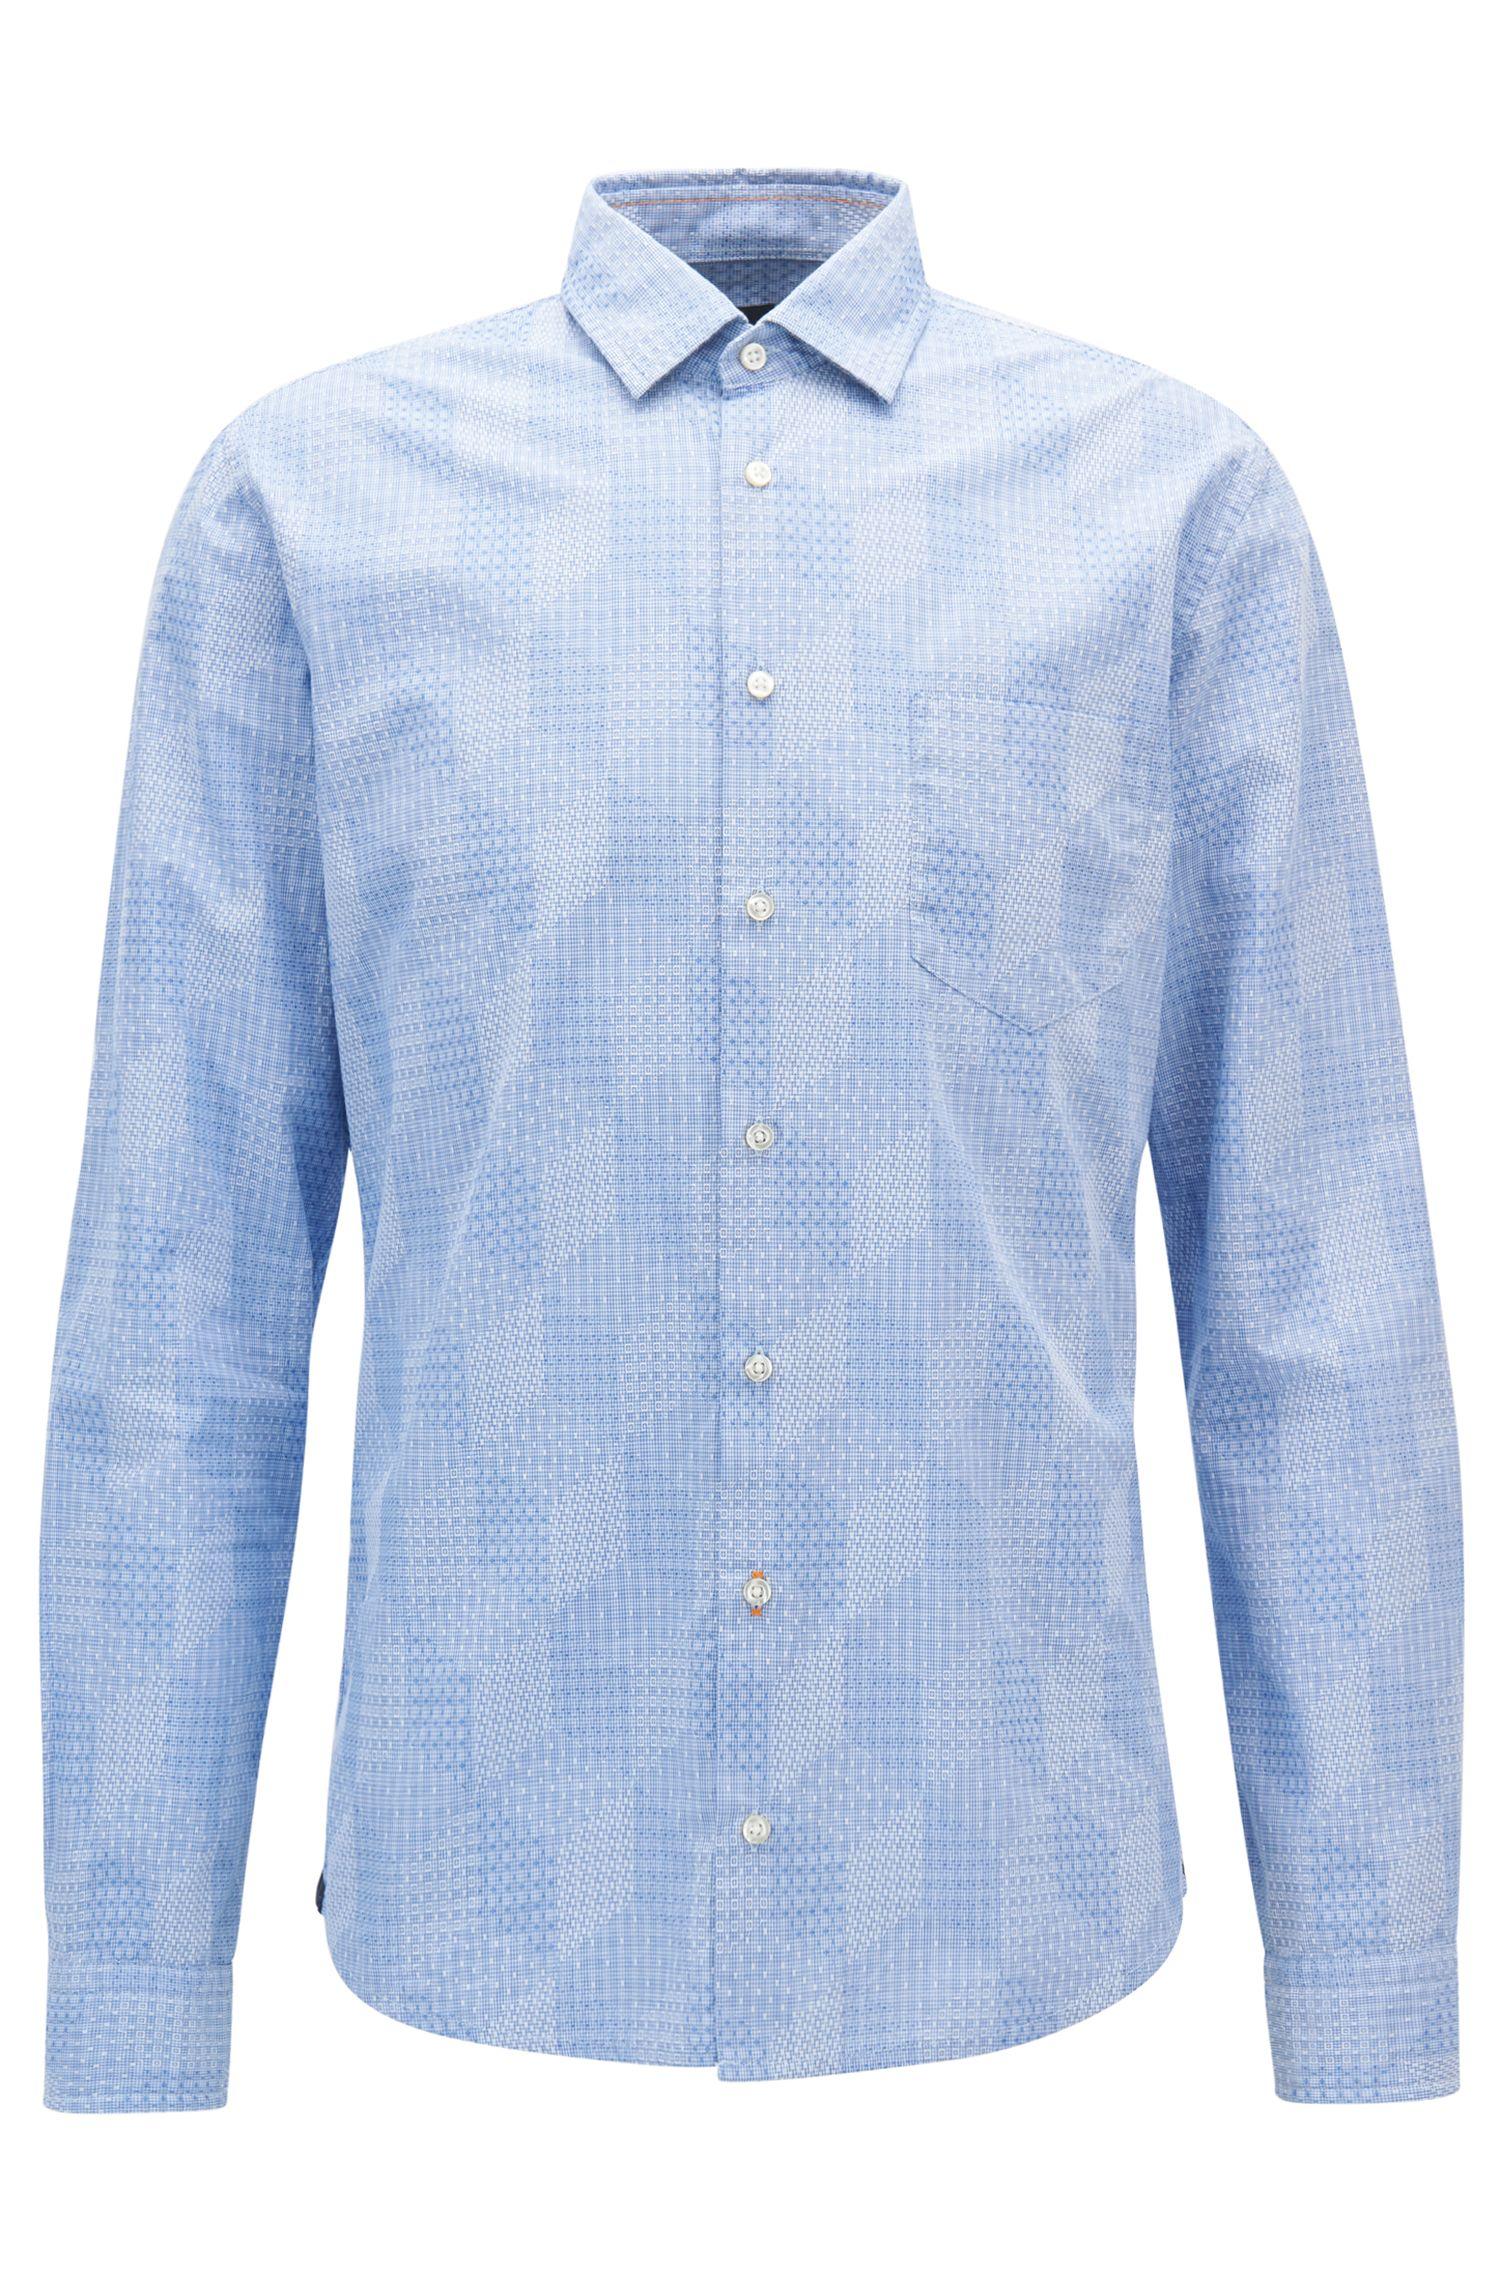 Camisa slim fit con estructura dobby integral